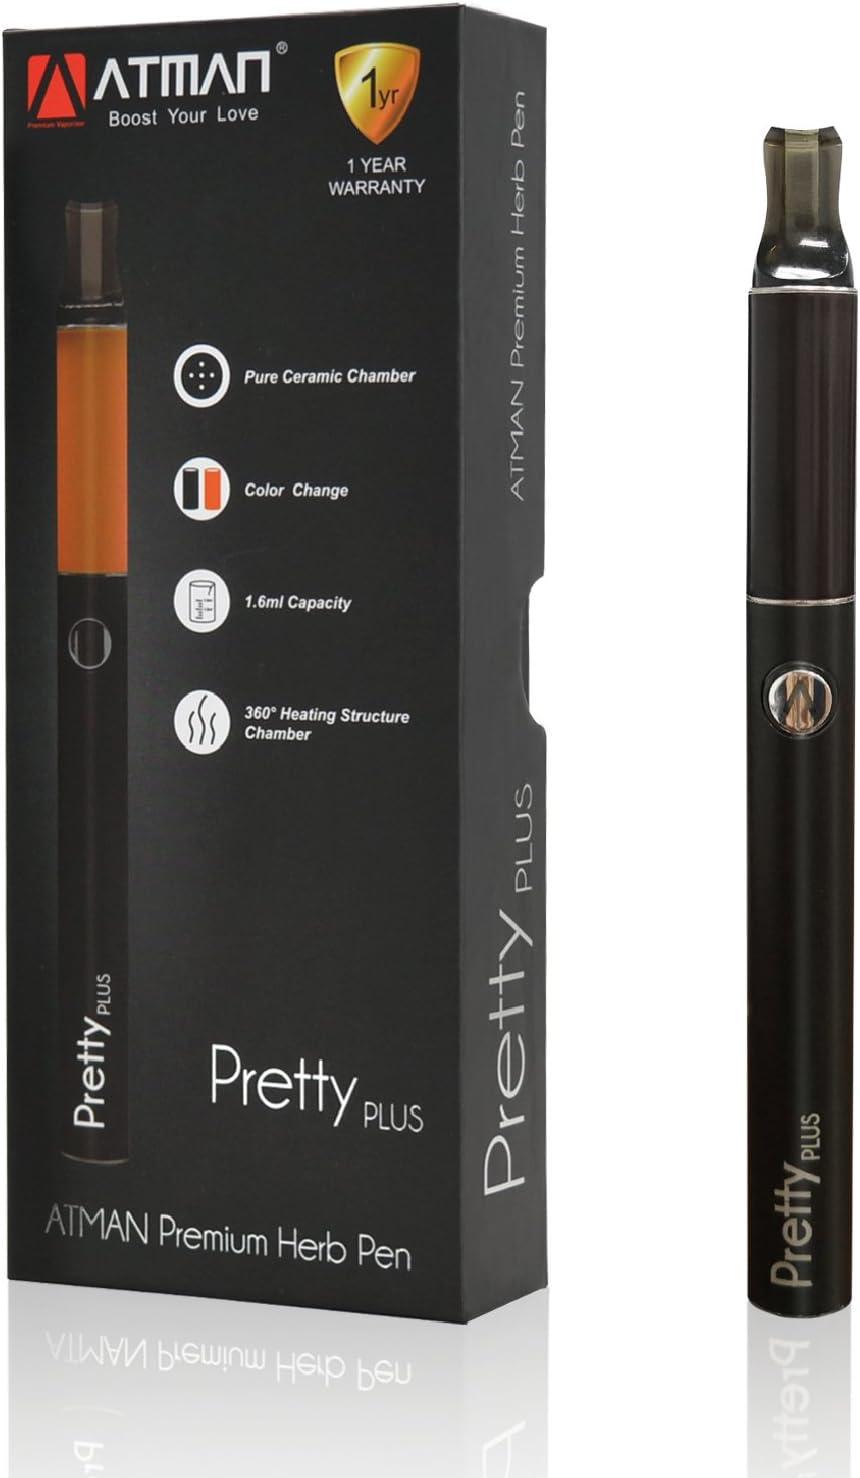 ATMAN® Pretty Plus vaporizador hierba seca,sin nicotina